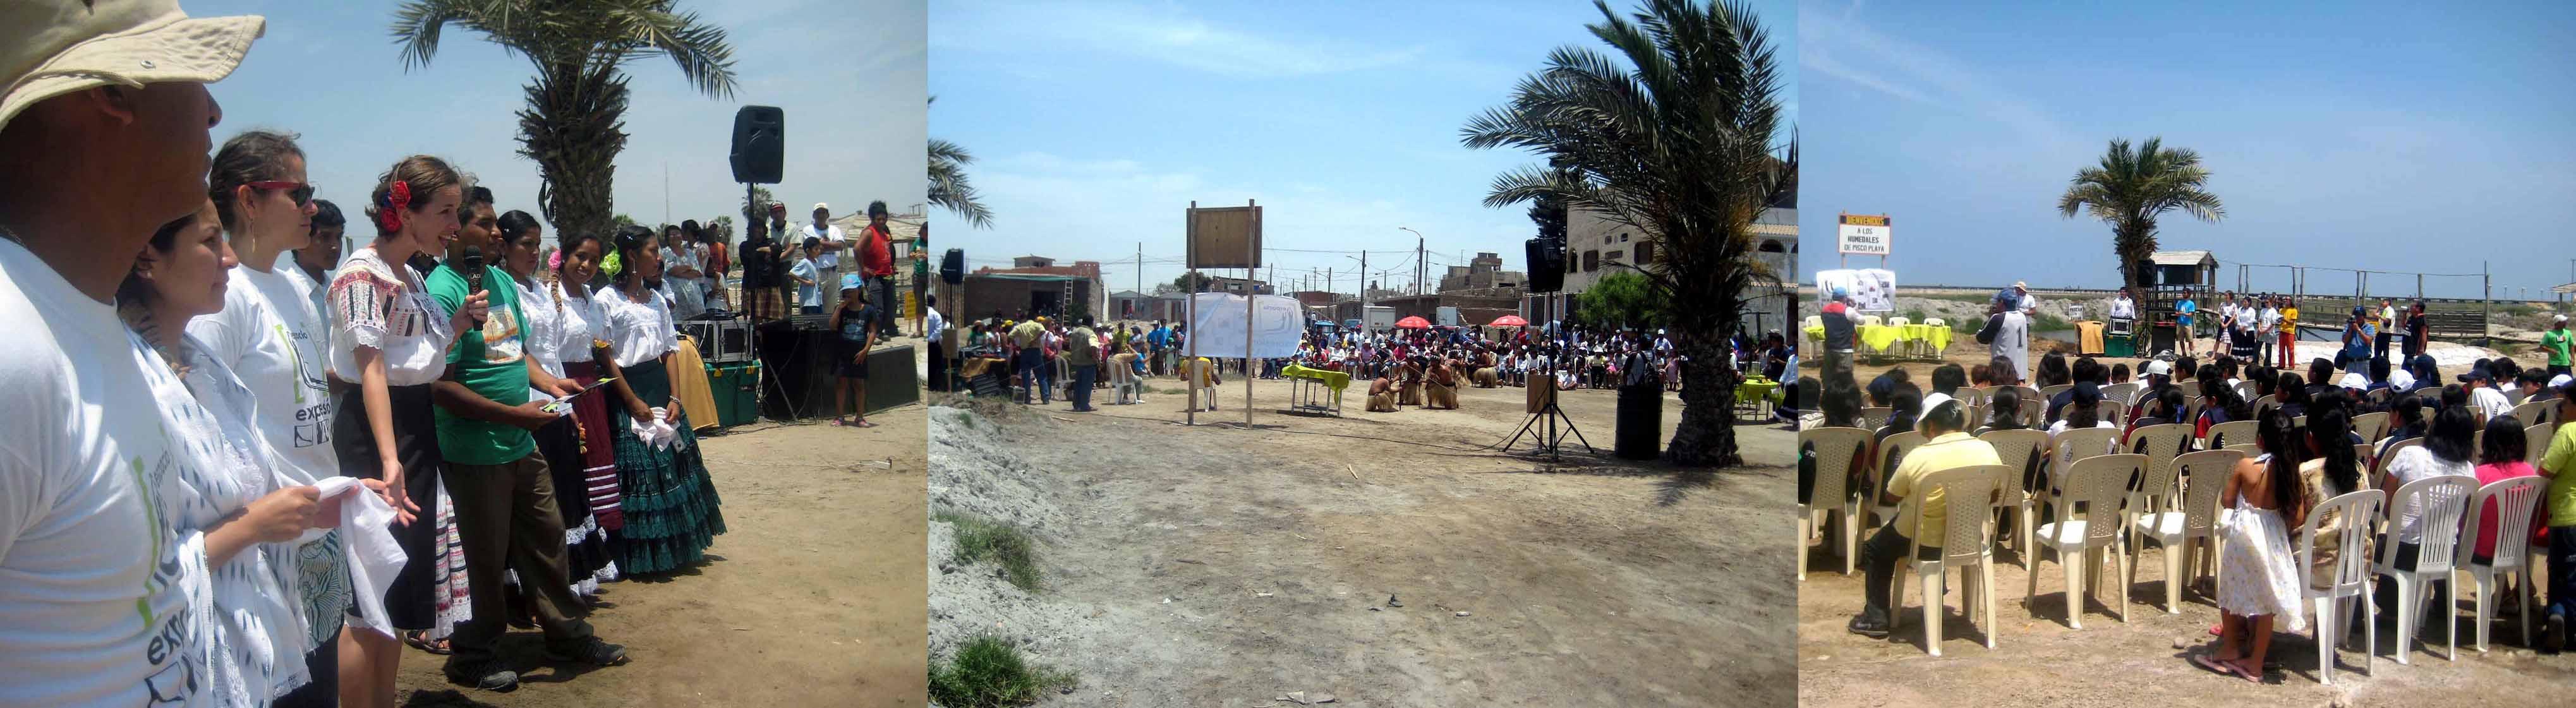 Primer Festival Eco-cultural